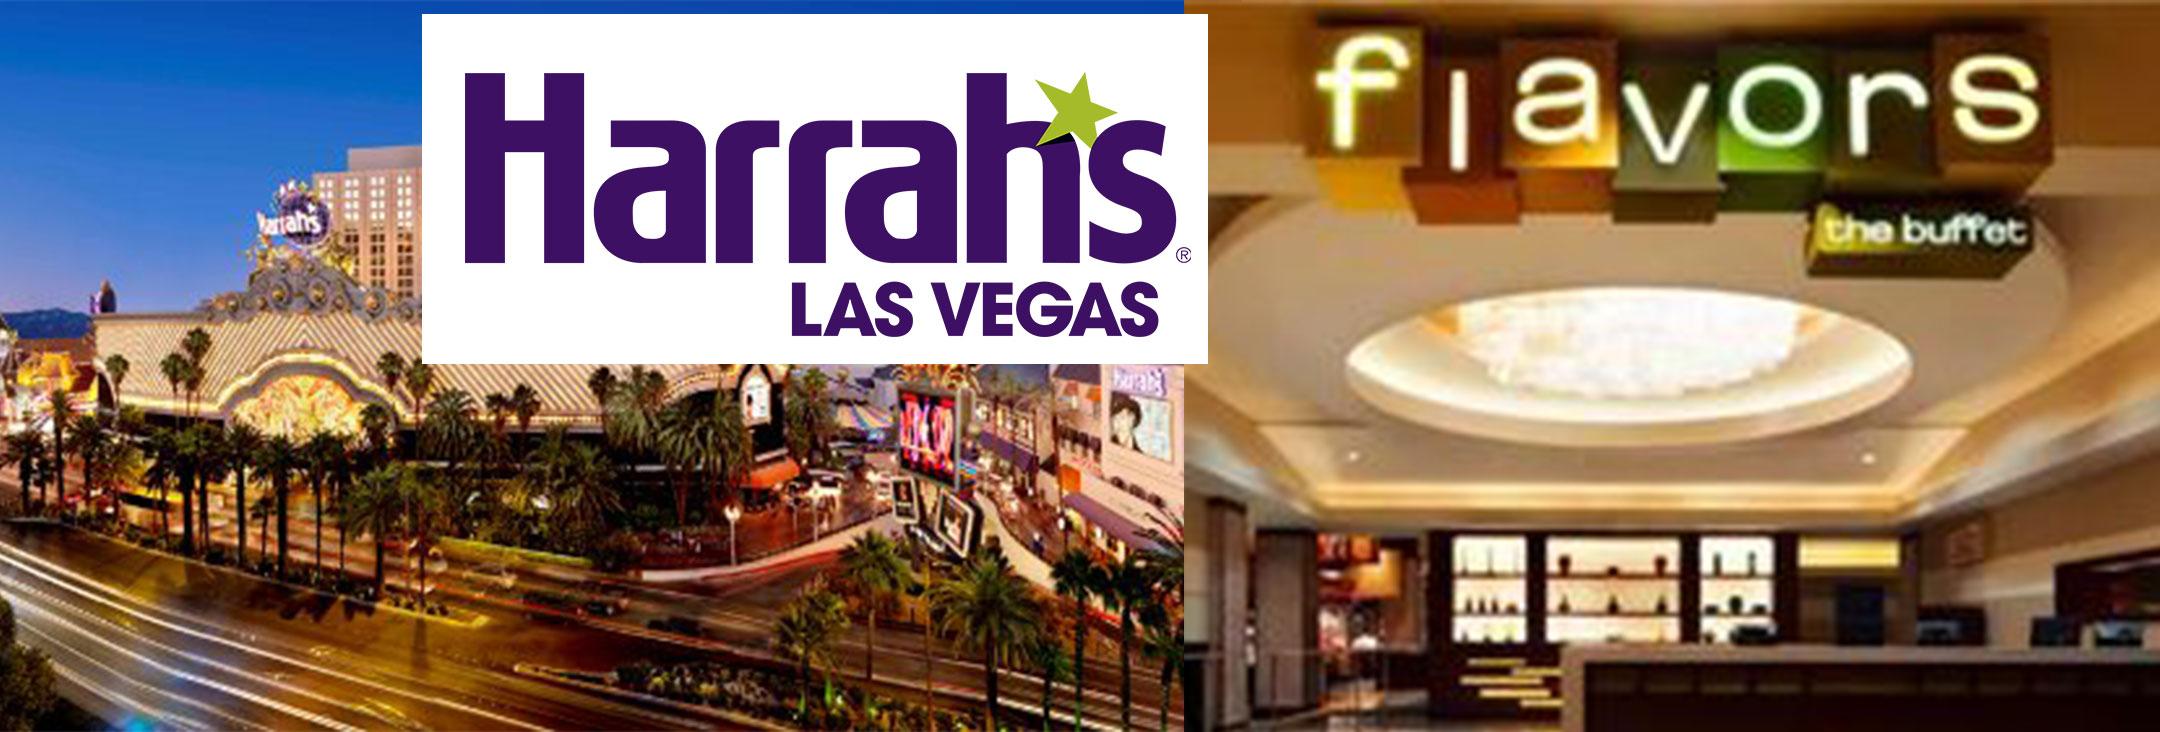 Harrahs Las Vegas Flavors Buffet